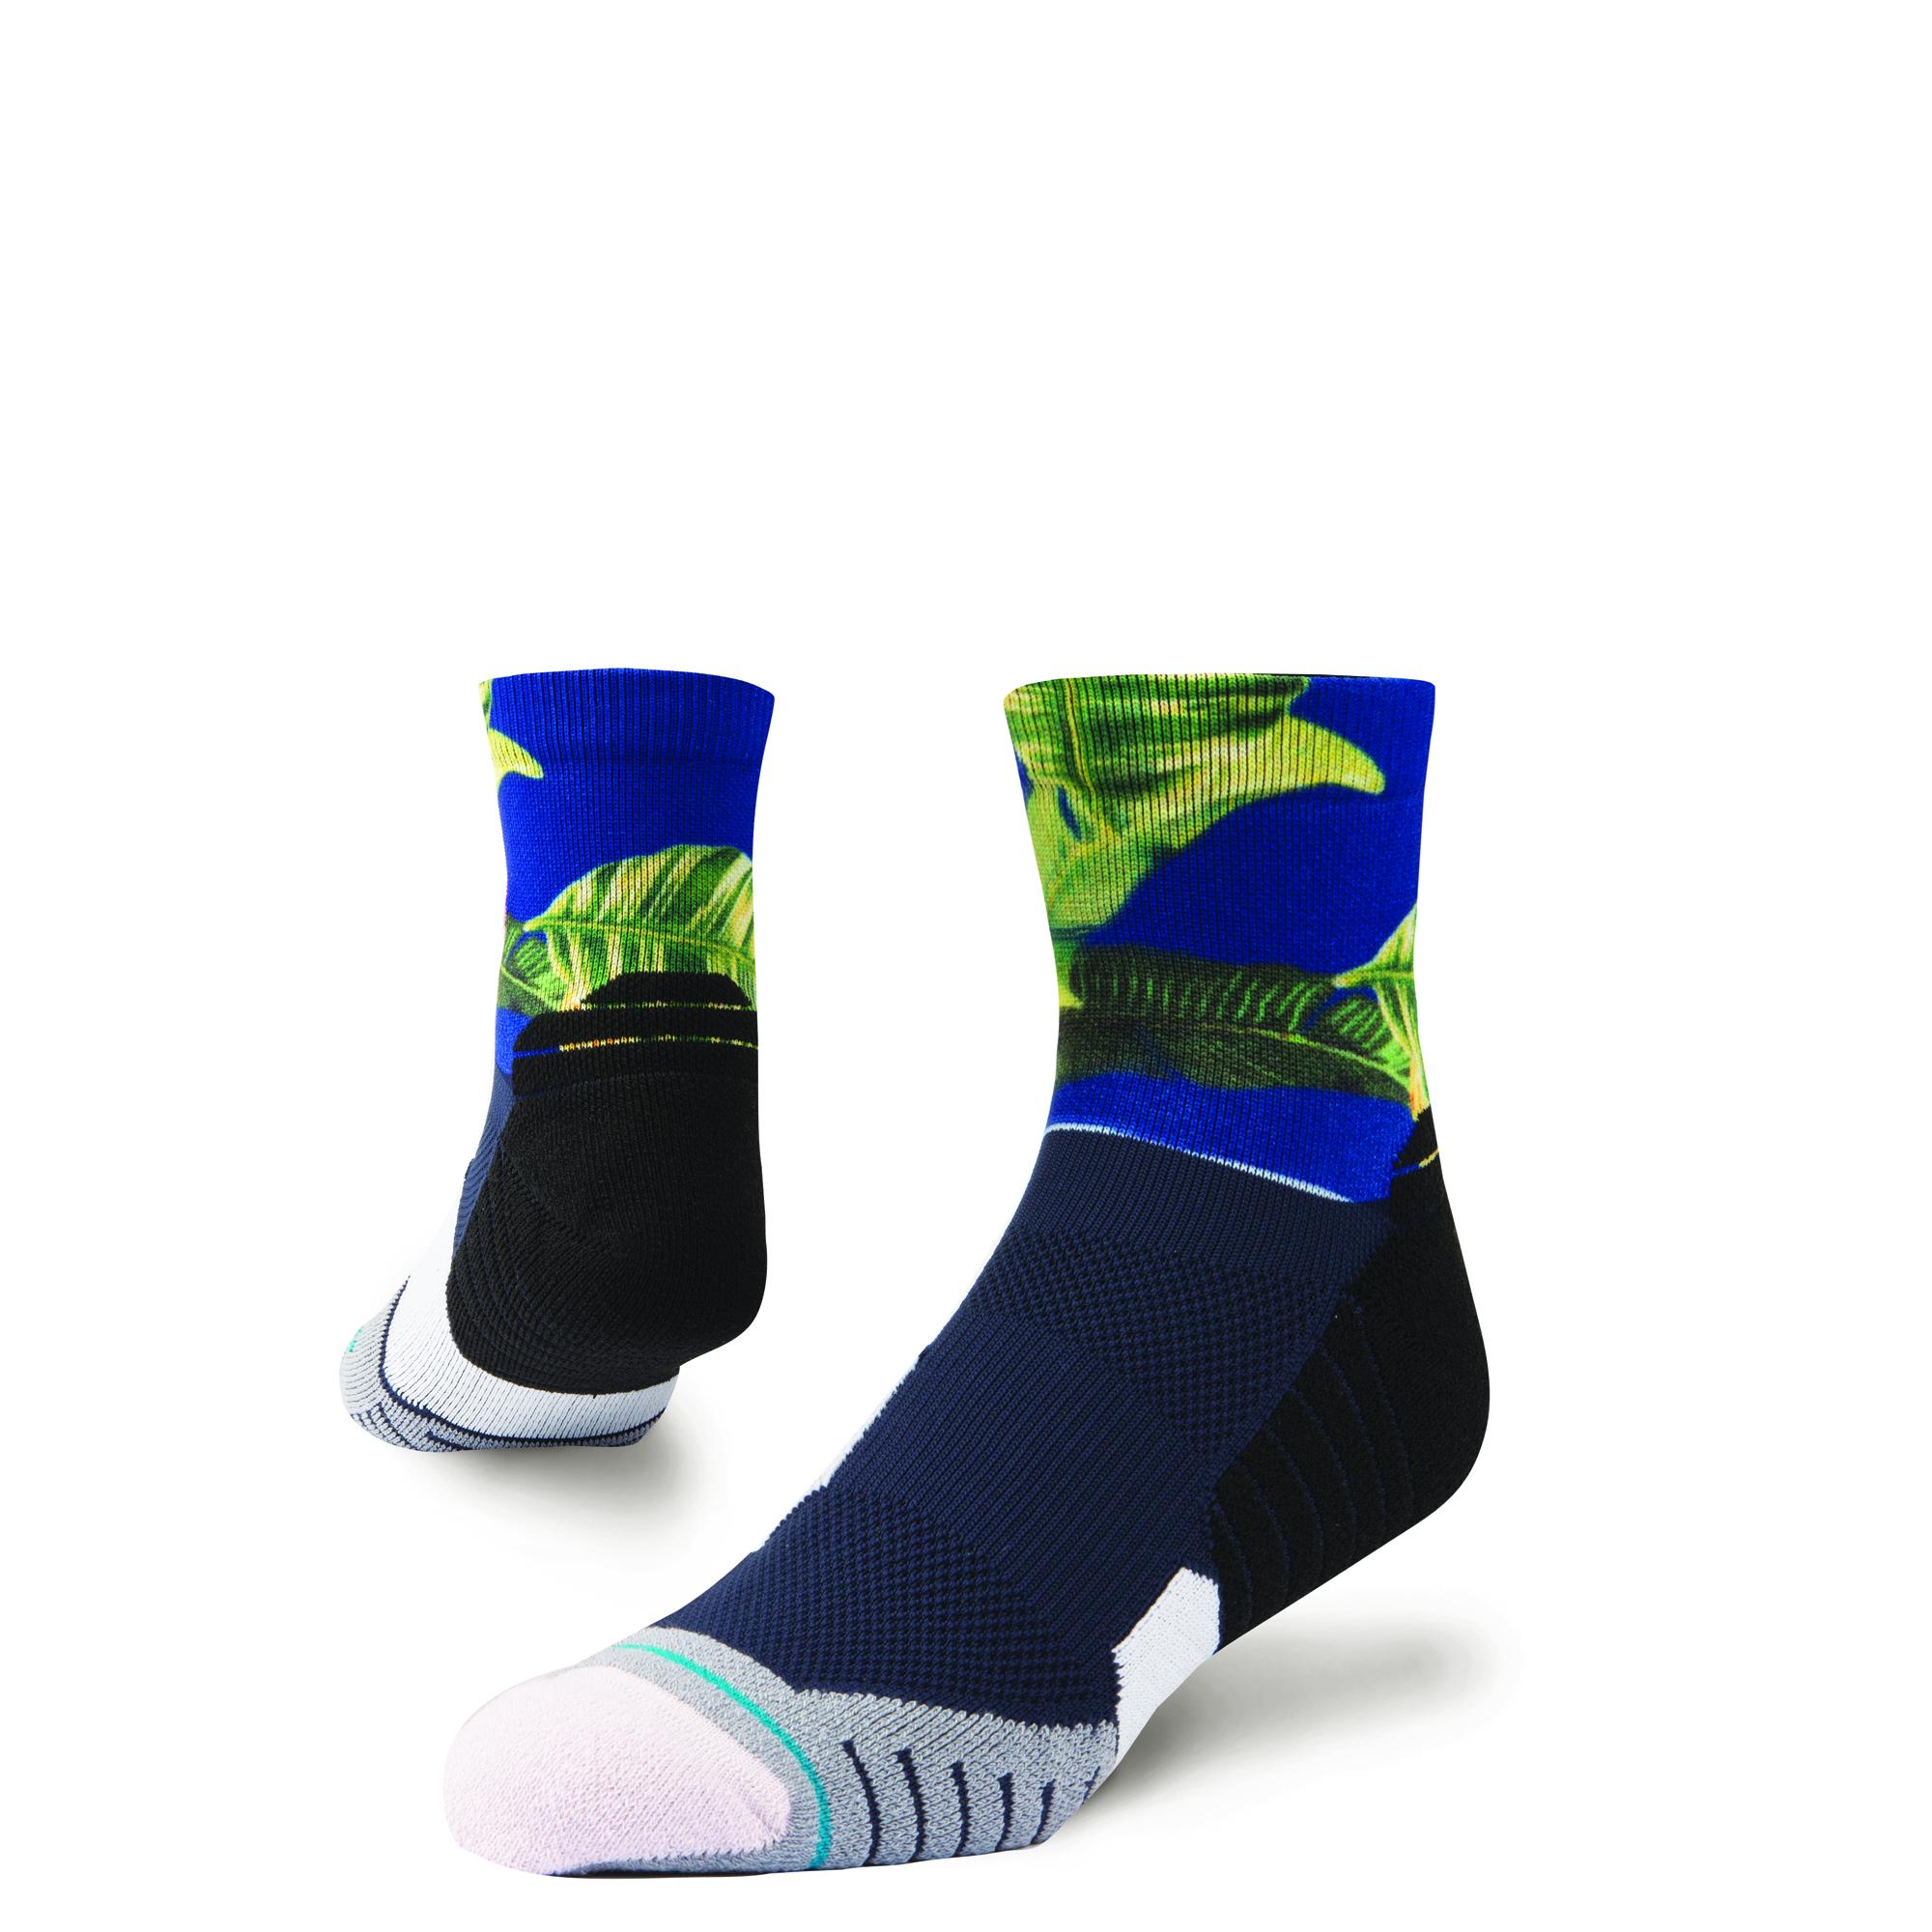 Lttle Lakes Outdoor Sock,RRP:£15.99